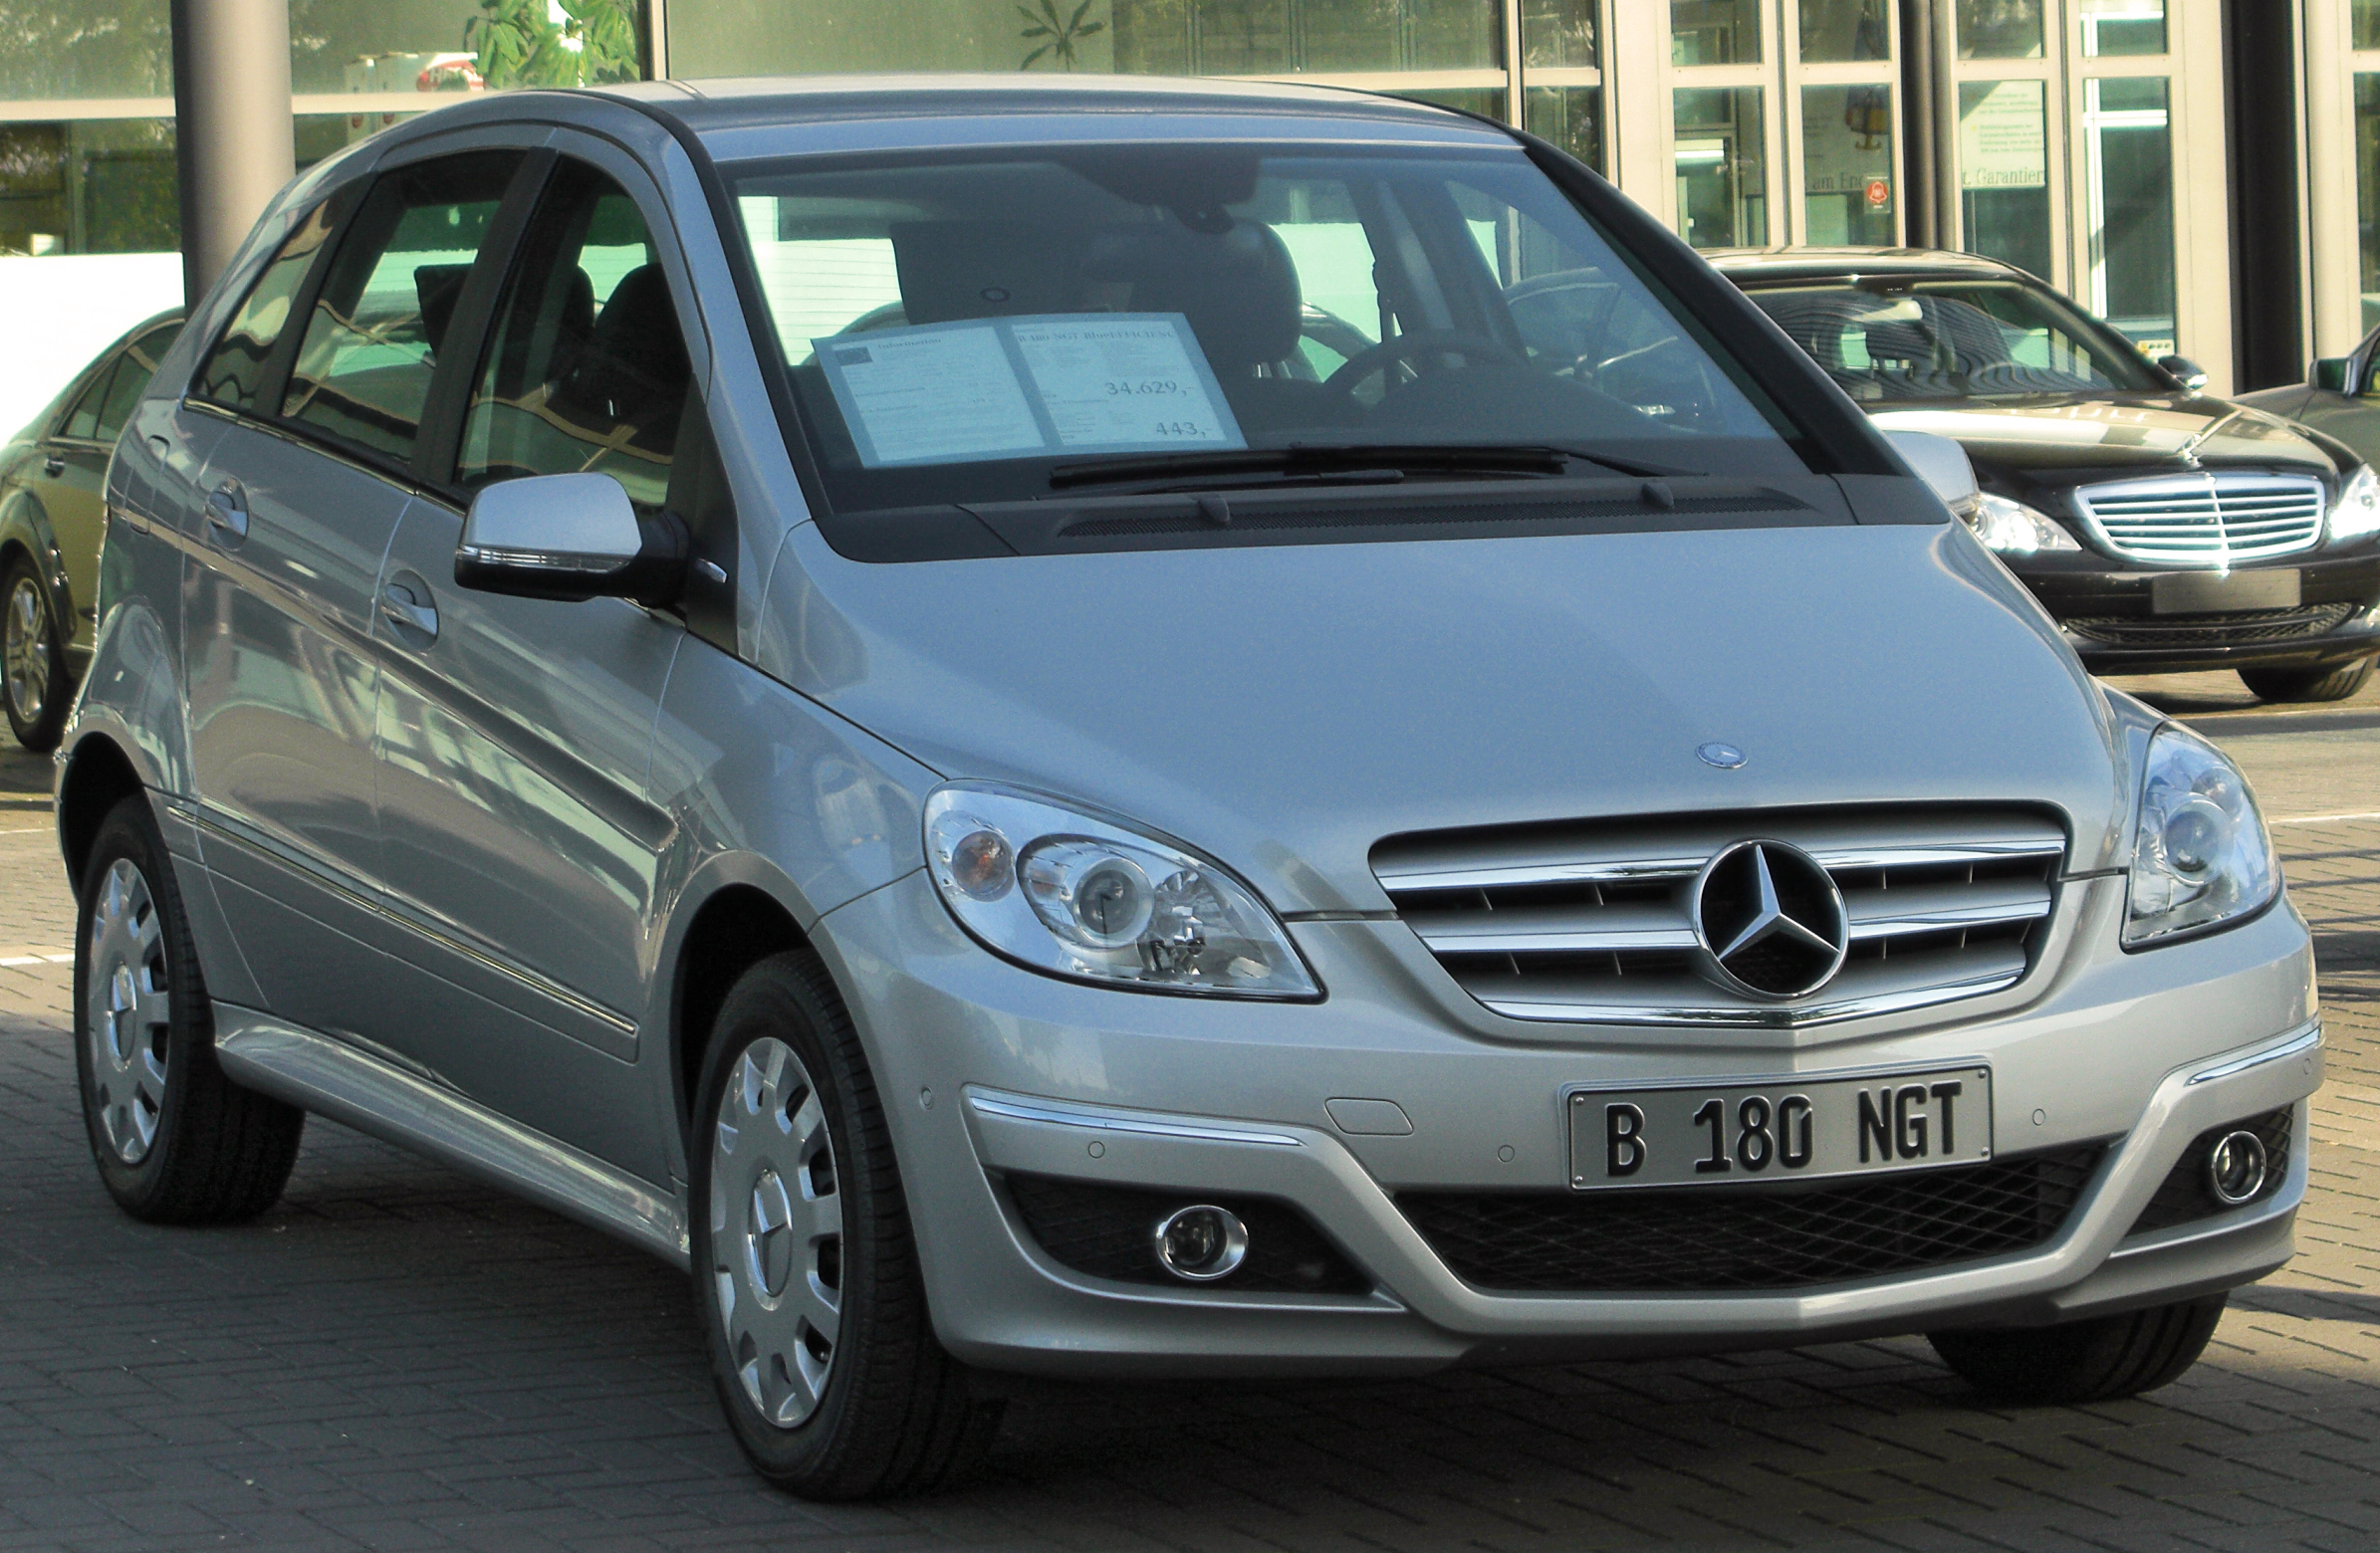 File:Mercedes B 180 NGT BlueEFFICIENCY (T245) Facelift ...